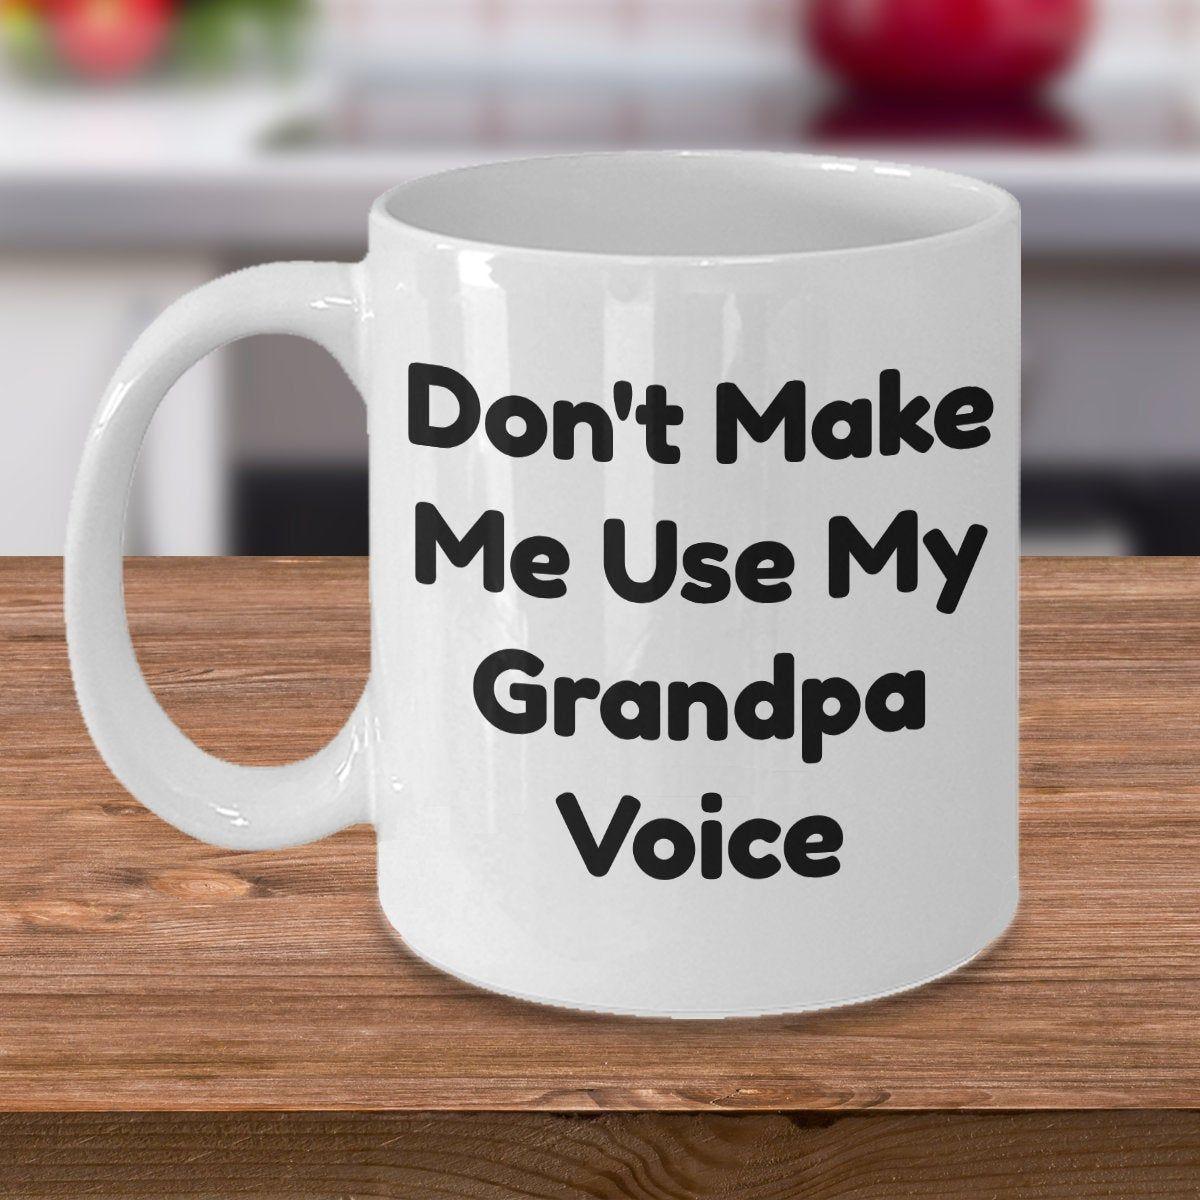 Funny Coffee Mug For Grandpa, Fathers Day Gift For Grandpa, Birthday Gift For Grandpa From Grandkids, Gift For Grandfather, New Grandpa Gift